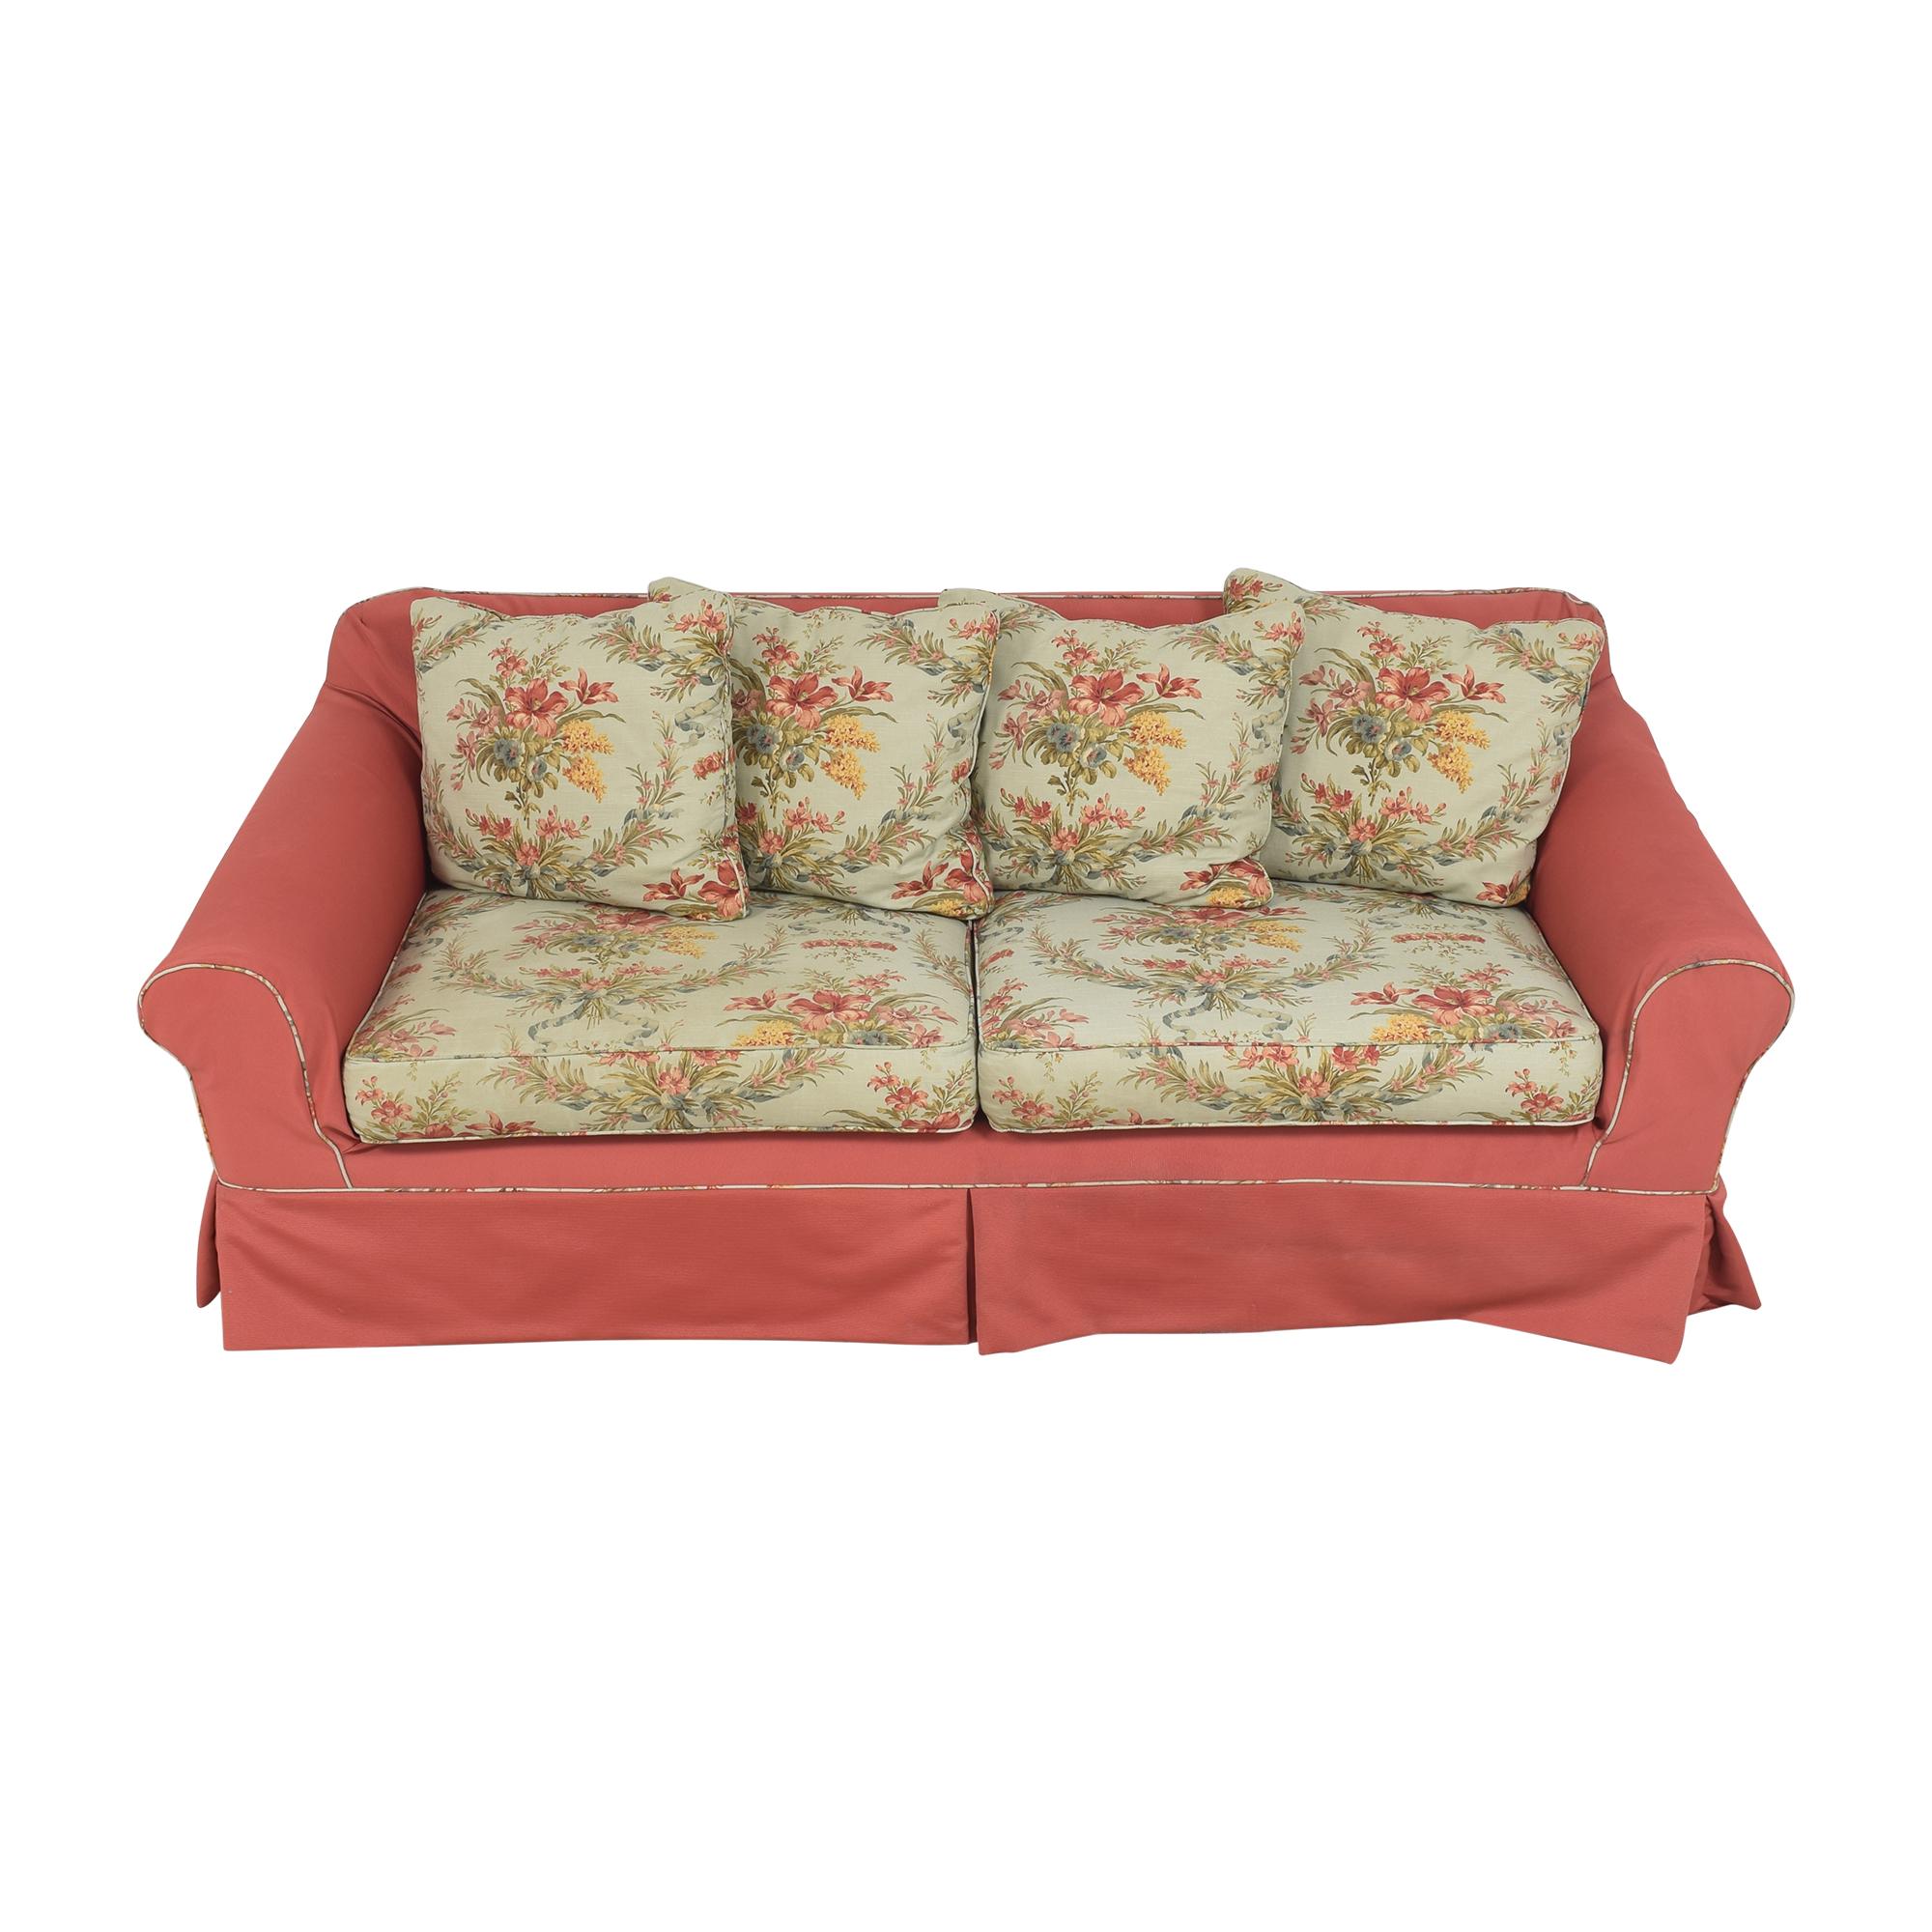 Ethan Allen Ethan Allen Slipcovered Sofa price